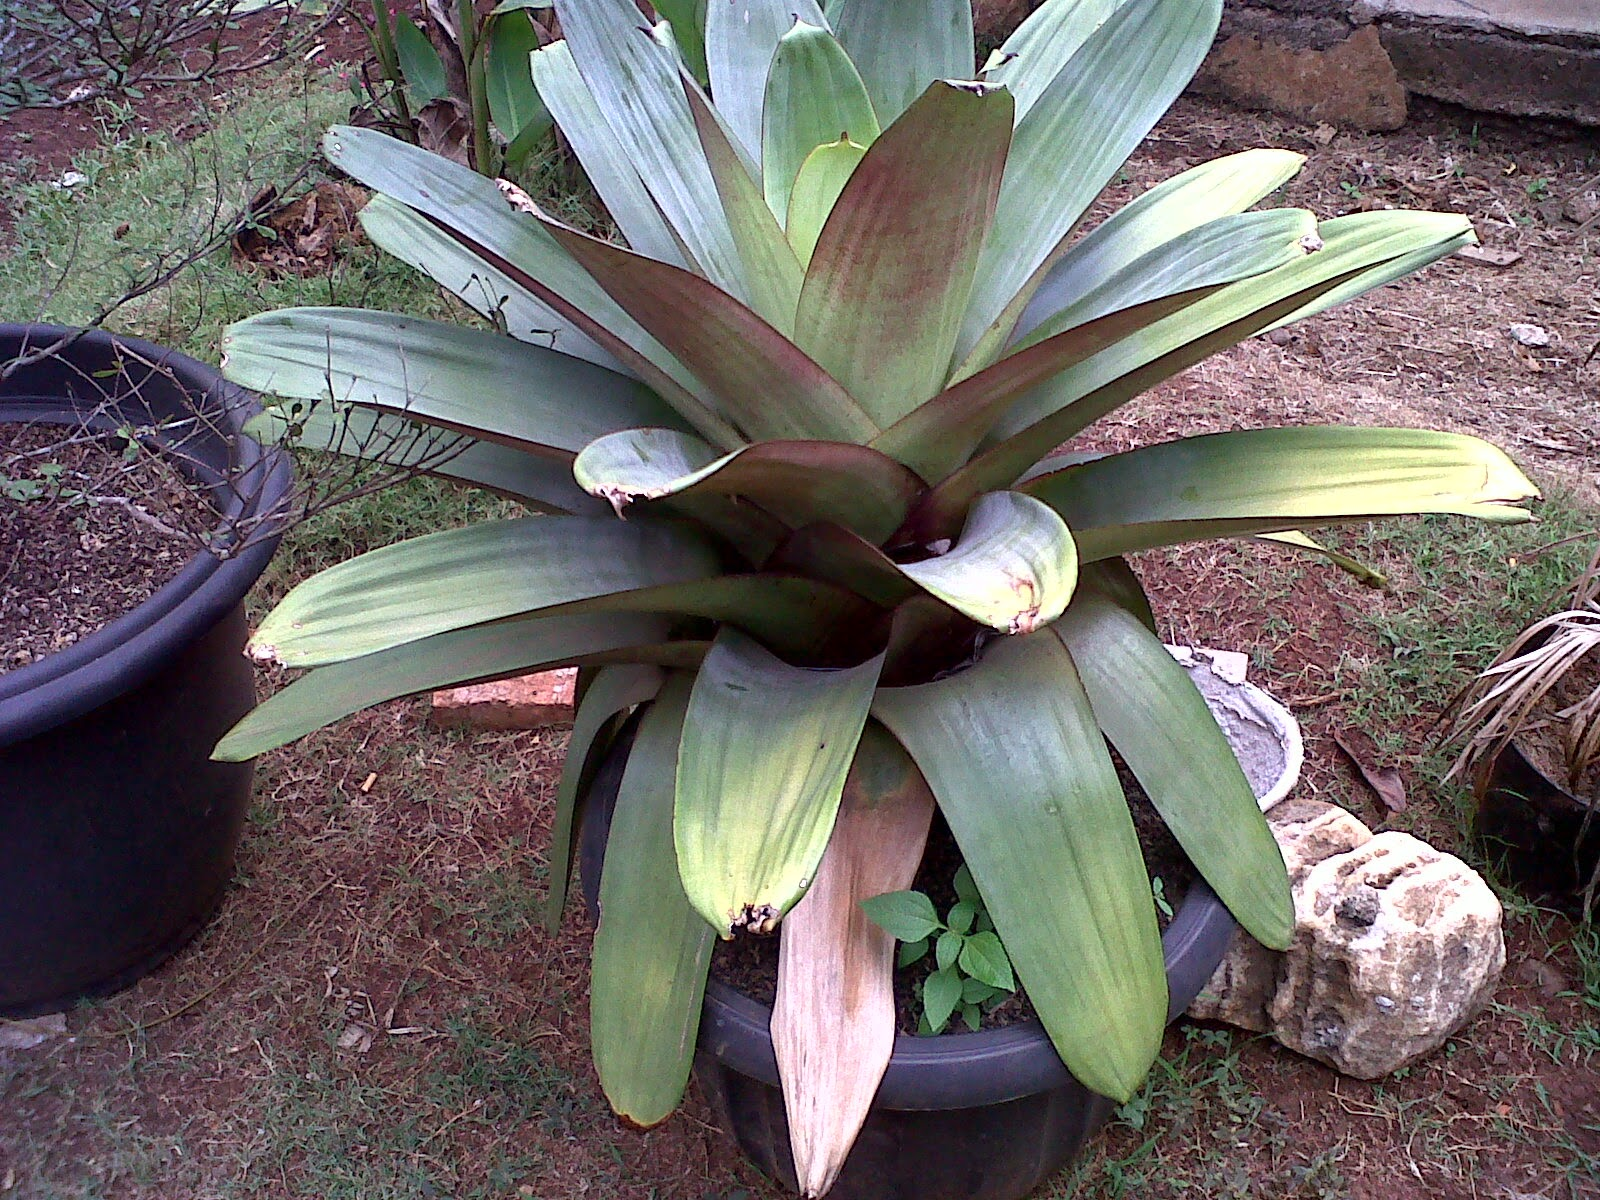 Jual aneka bromelia | Aglaonema | Suplier tanaman hias | Jasa tukang taman | Renovasi taman